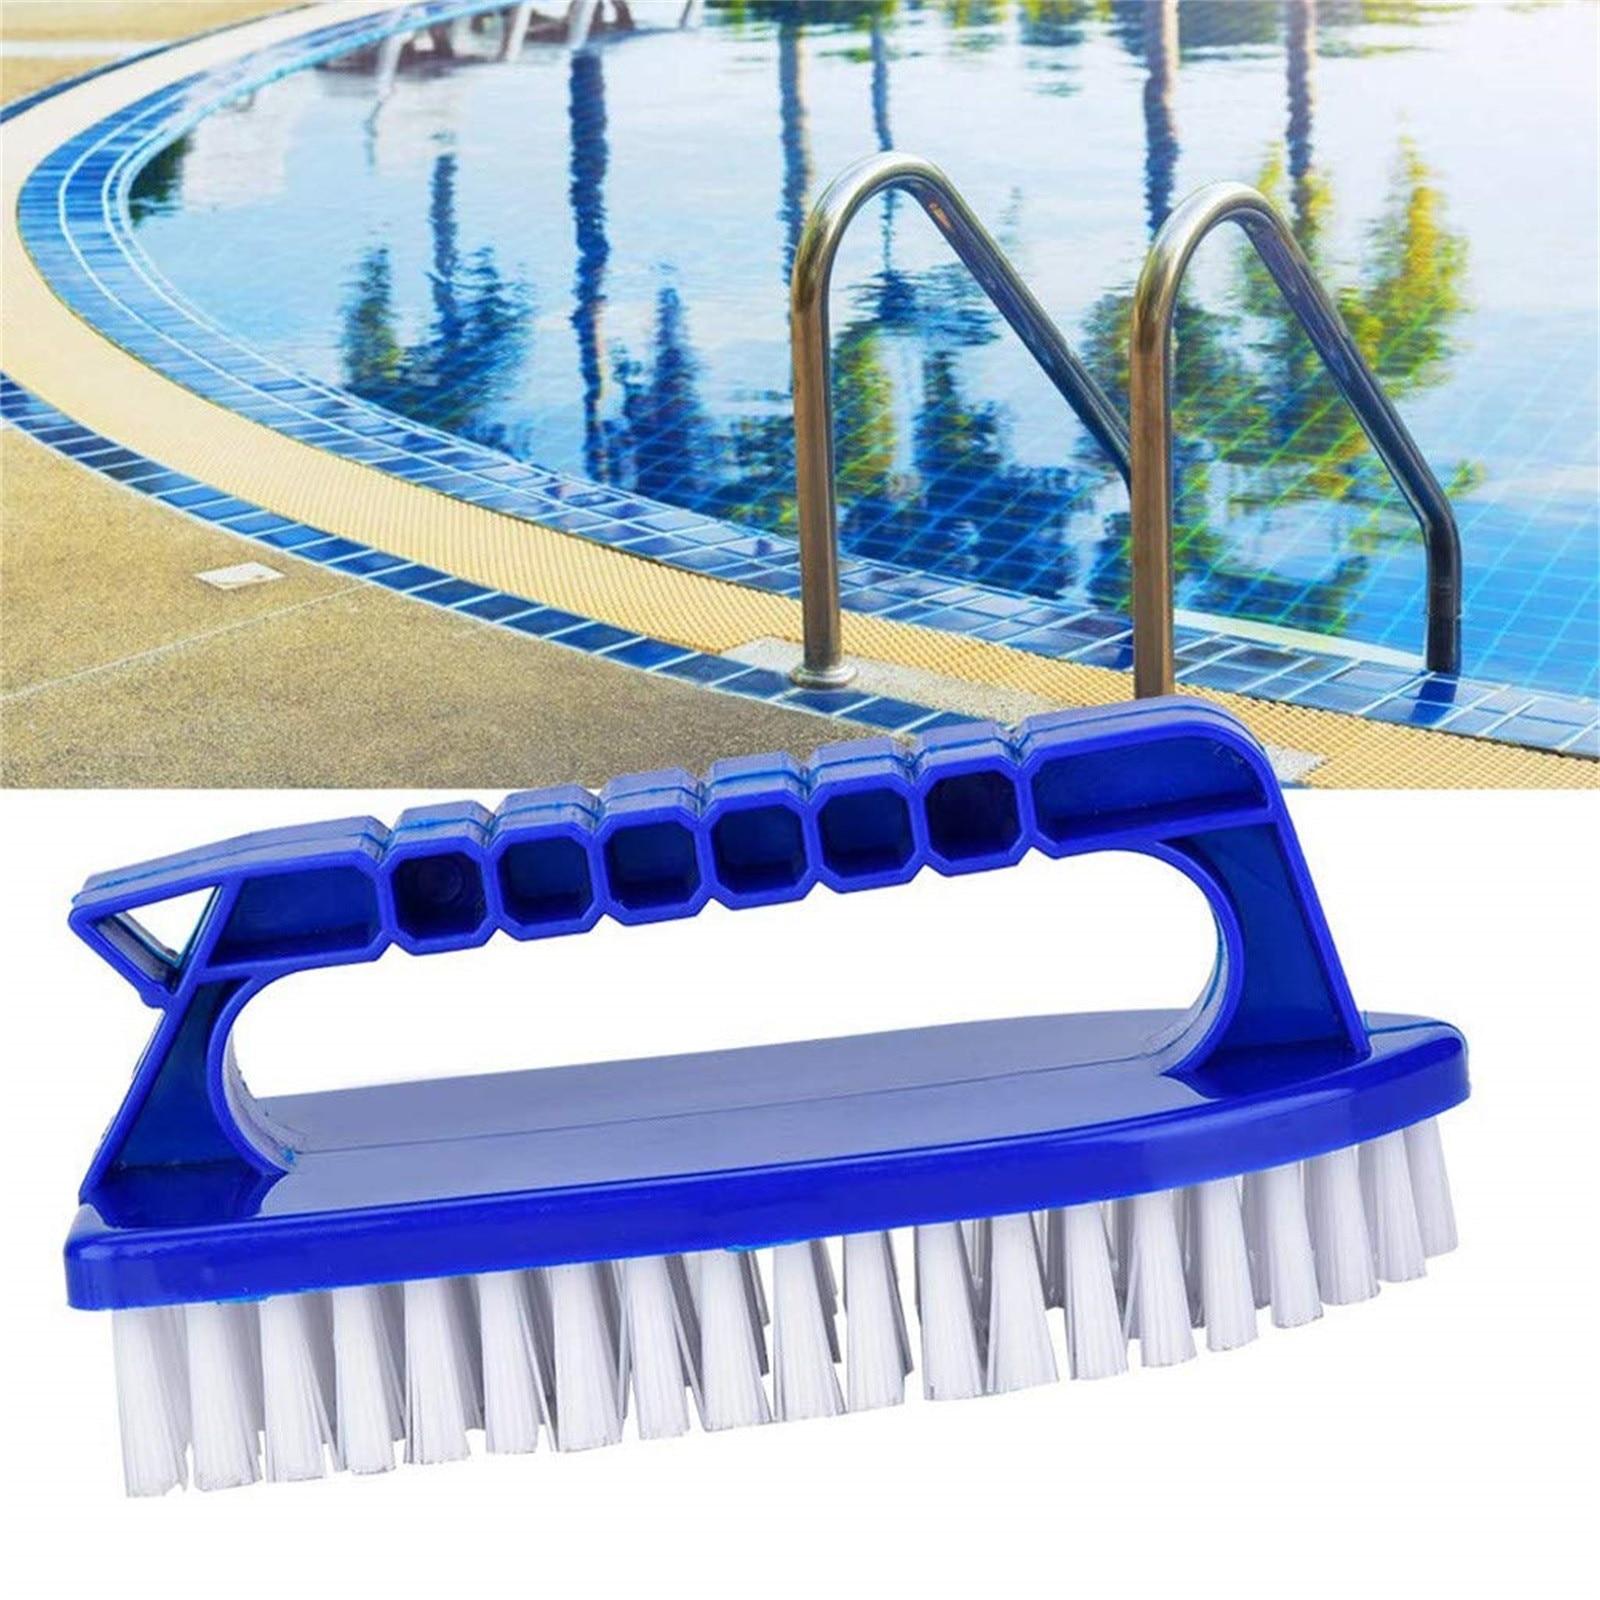 Cepillo de limpieza portátil para piscina, juego de escoba para limpiar piscinas,...